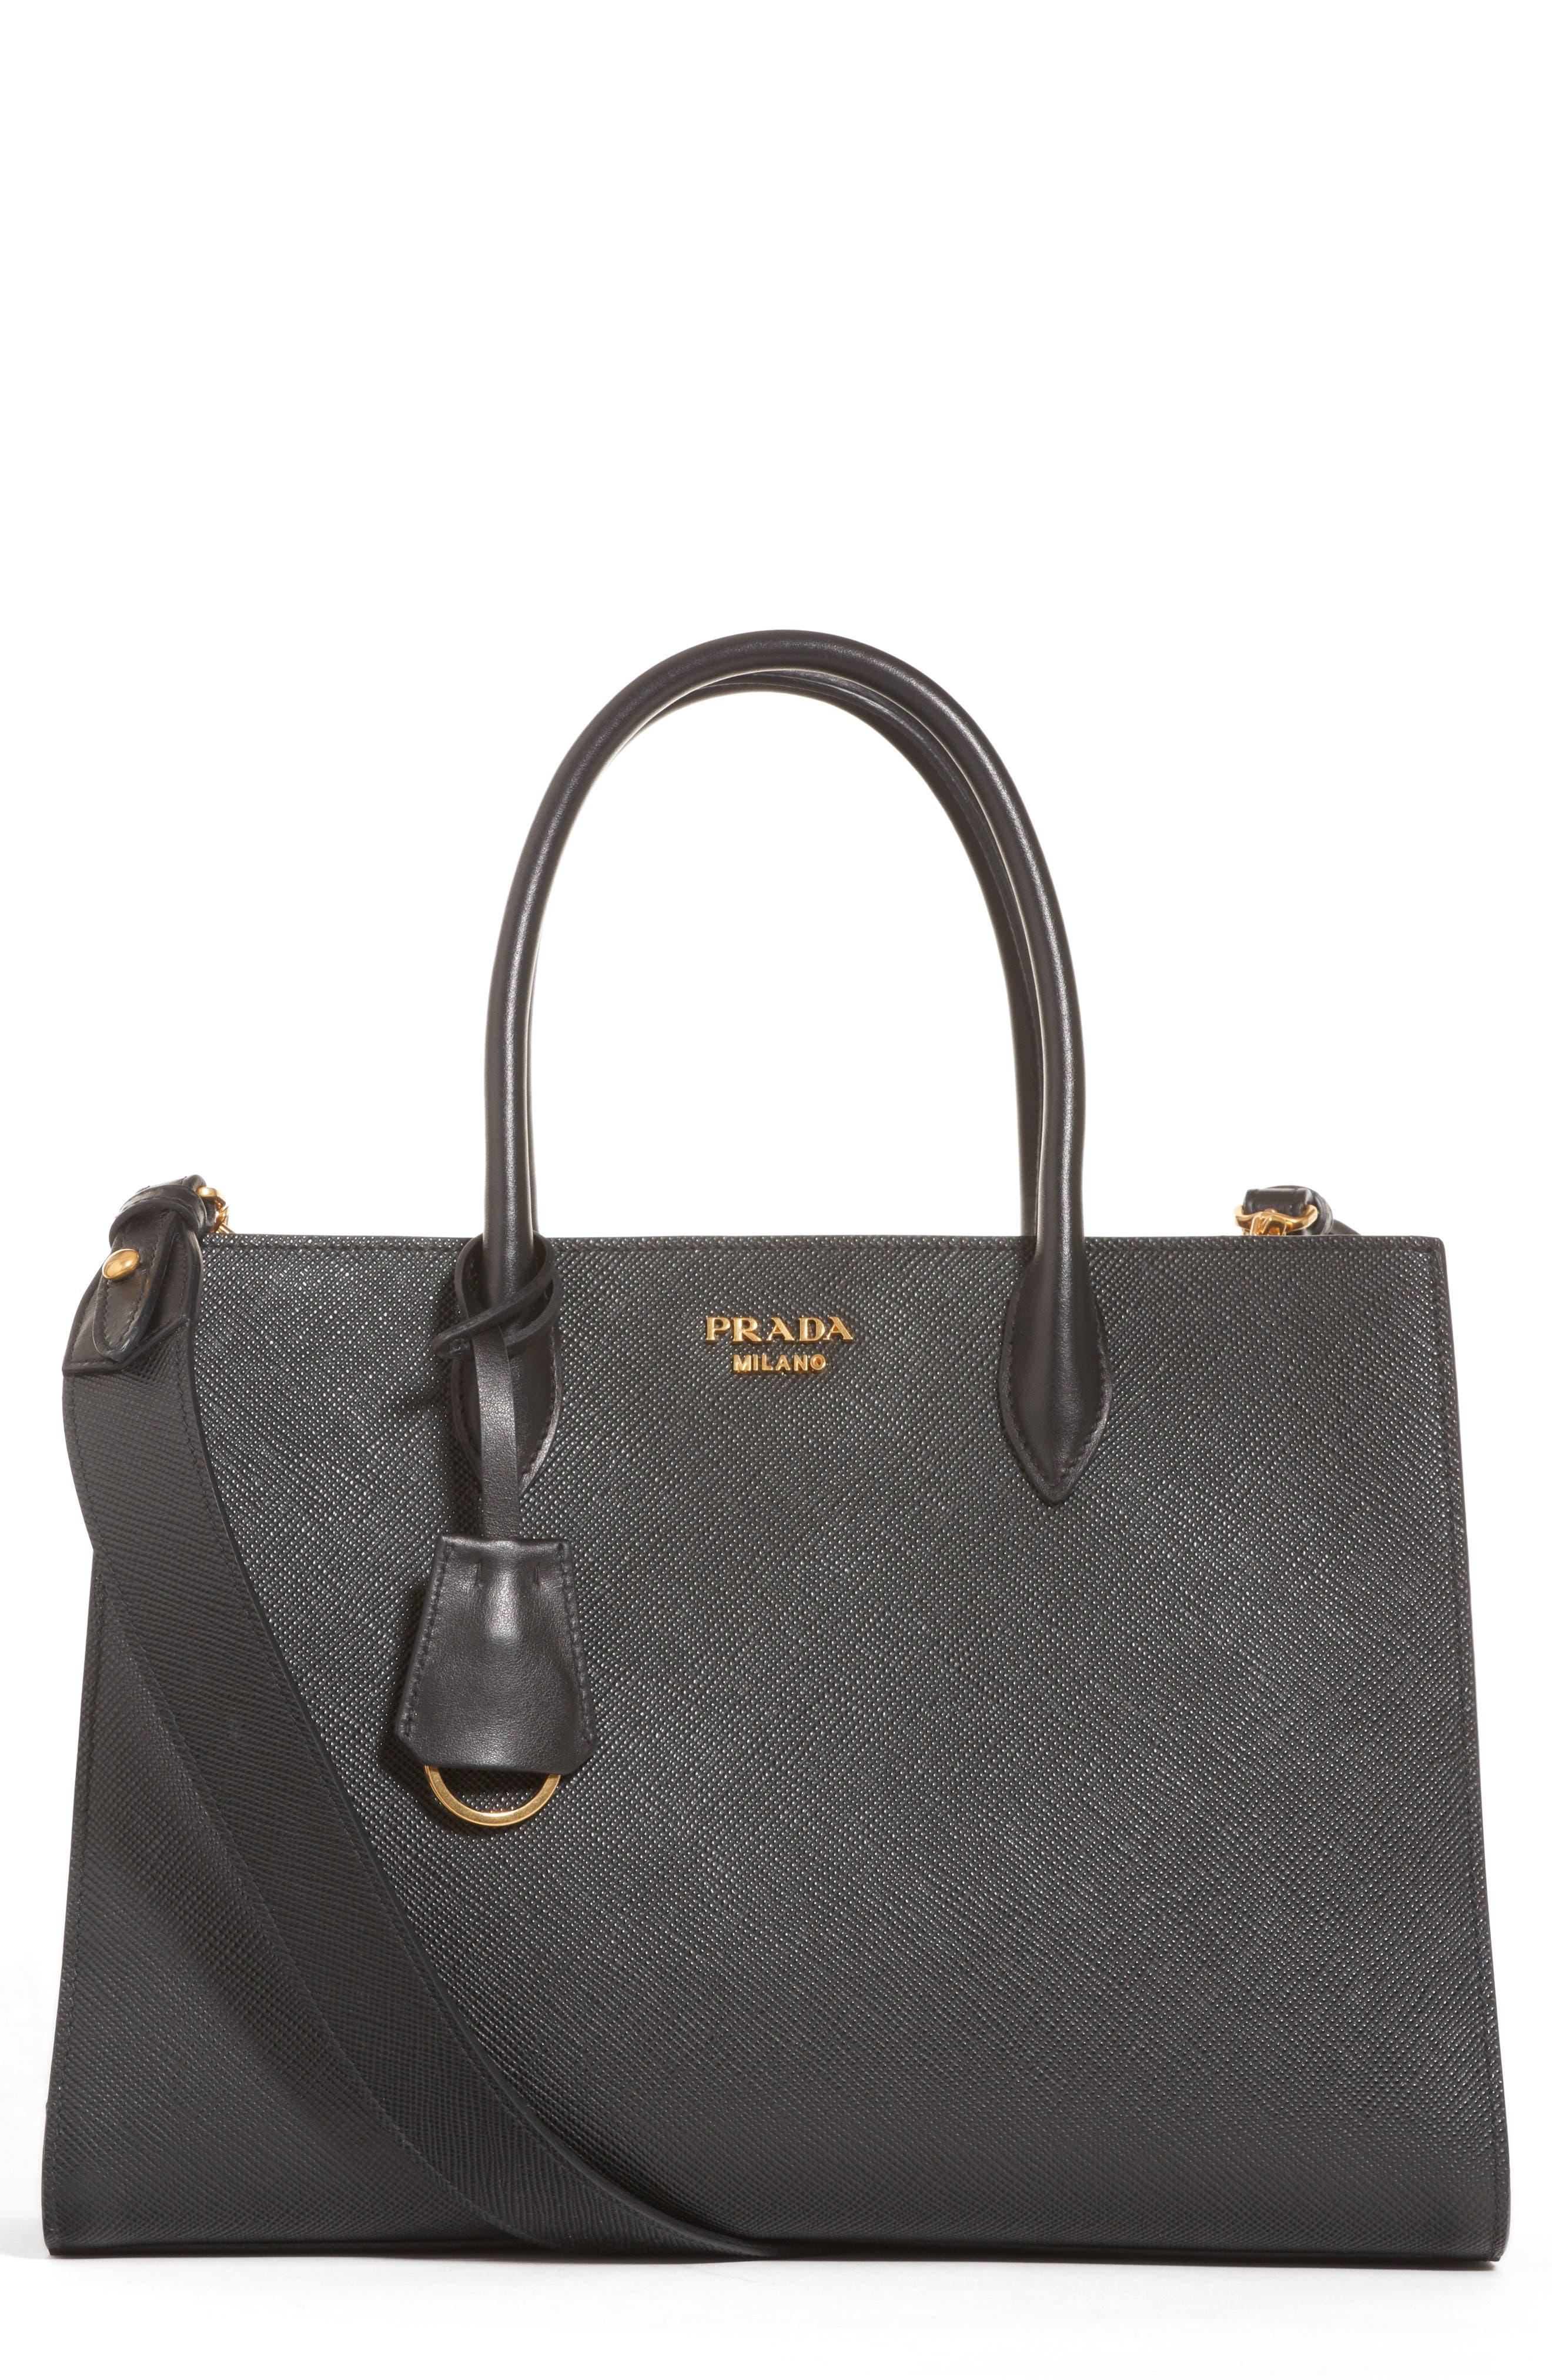 Medium Saffiano Leather Tote,                         Main,                         color, 001